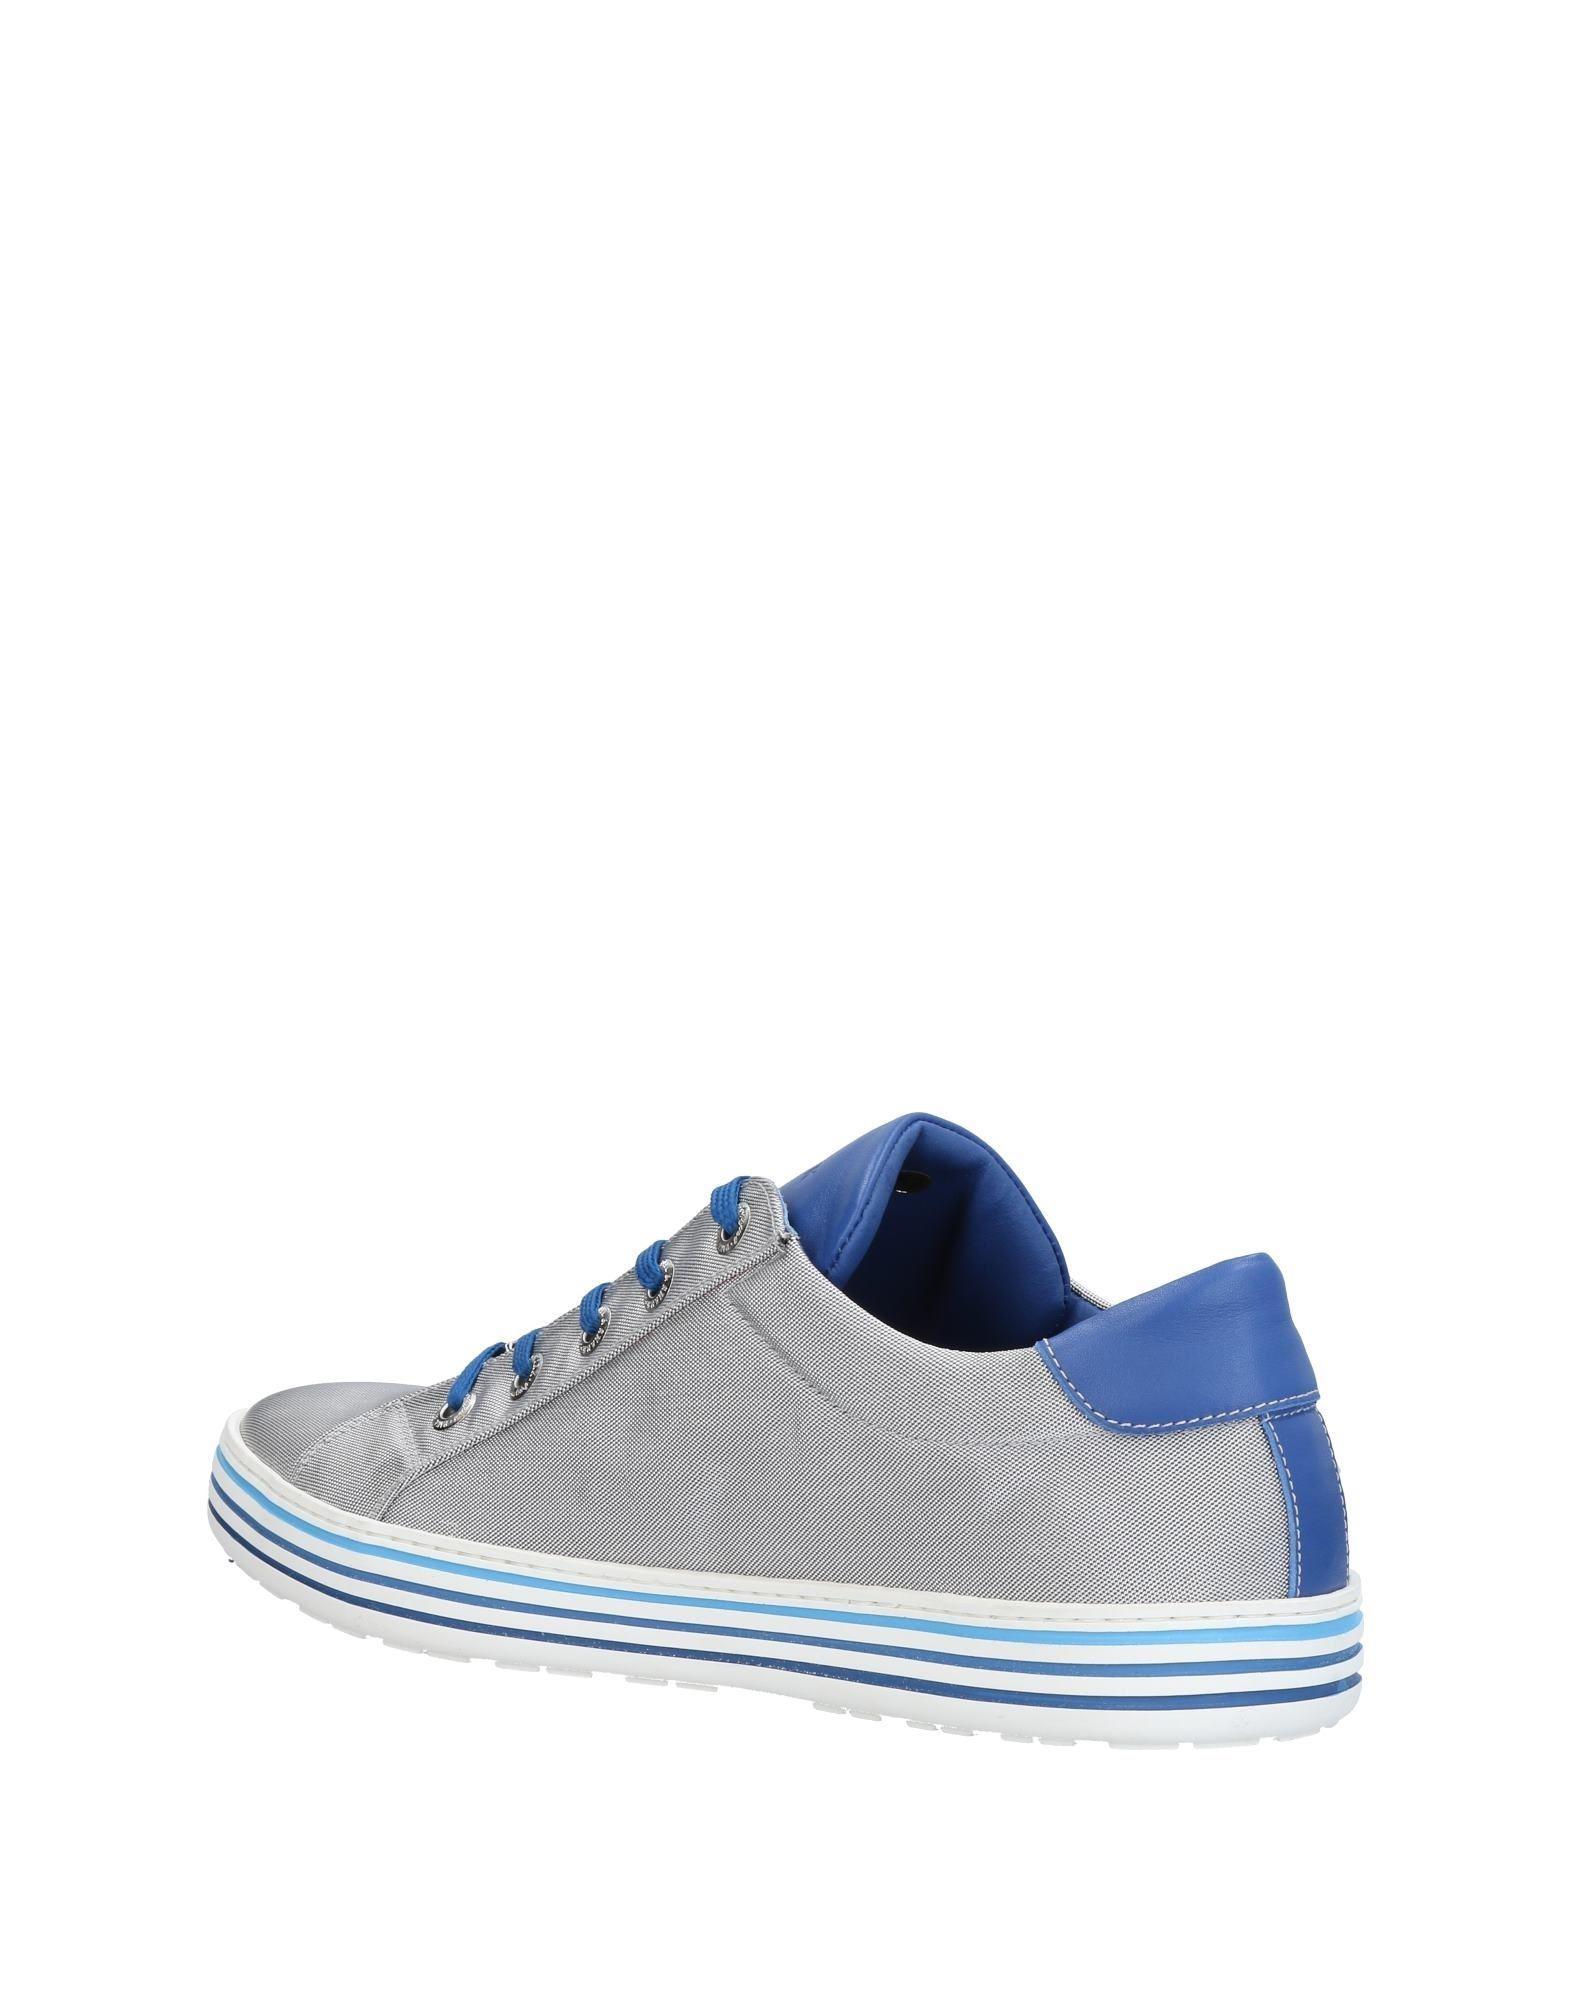 FOOTWEAR - Low-tops & sneakers Paul & Shark 6NyqaaK